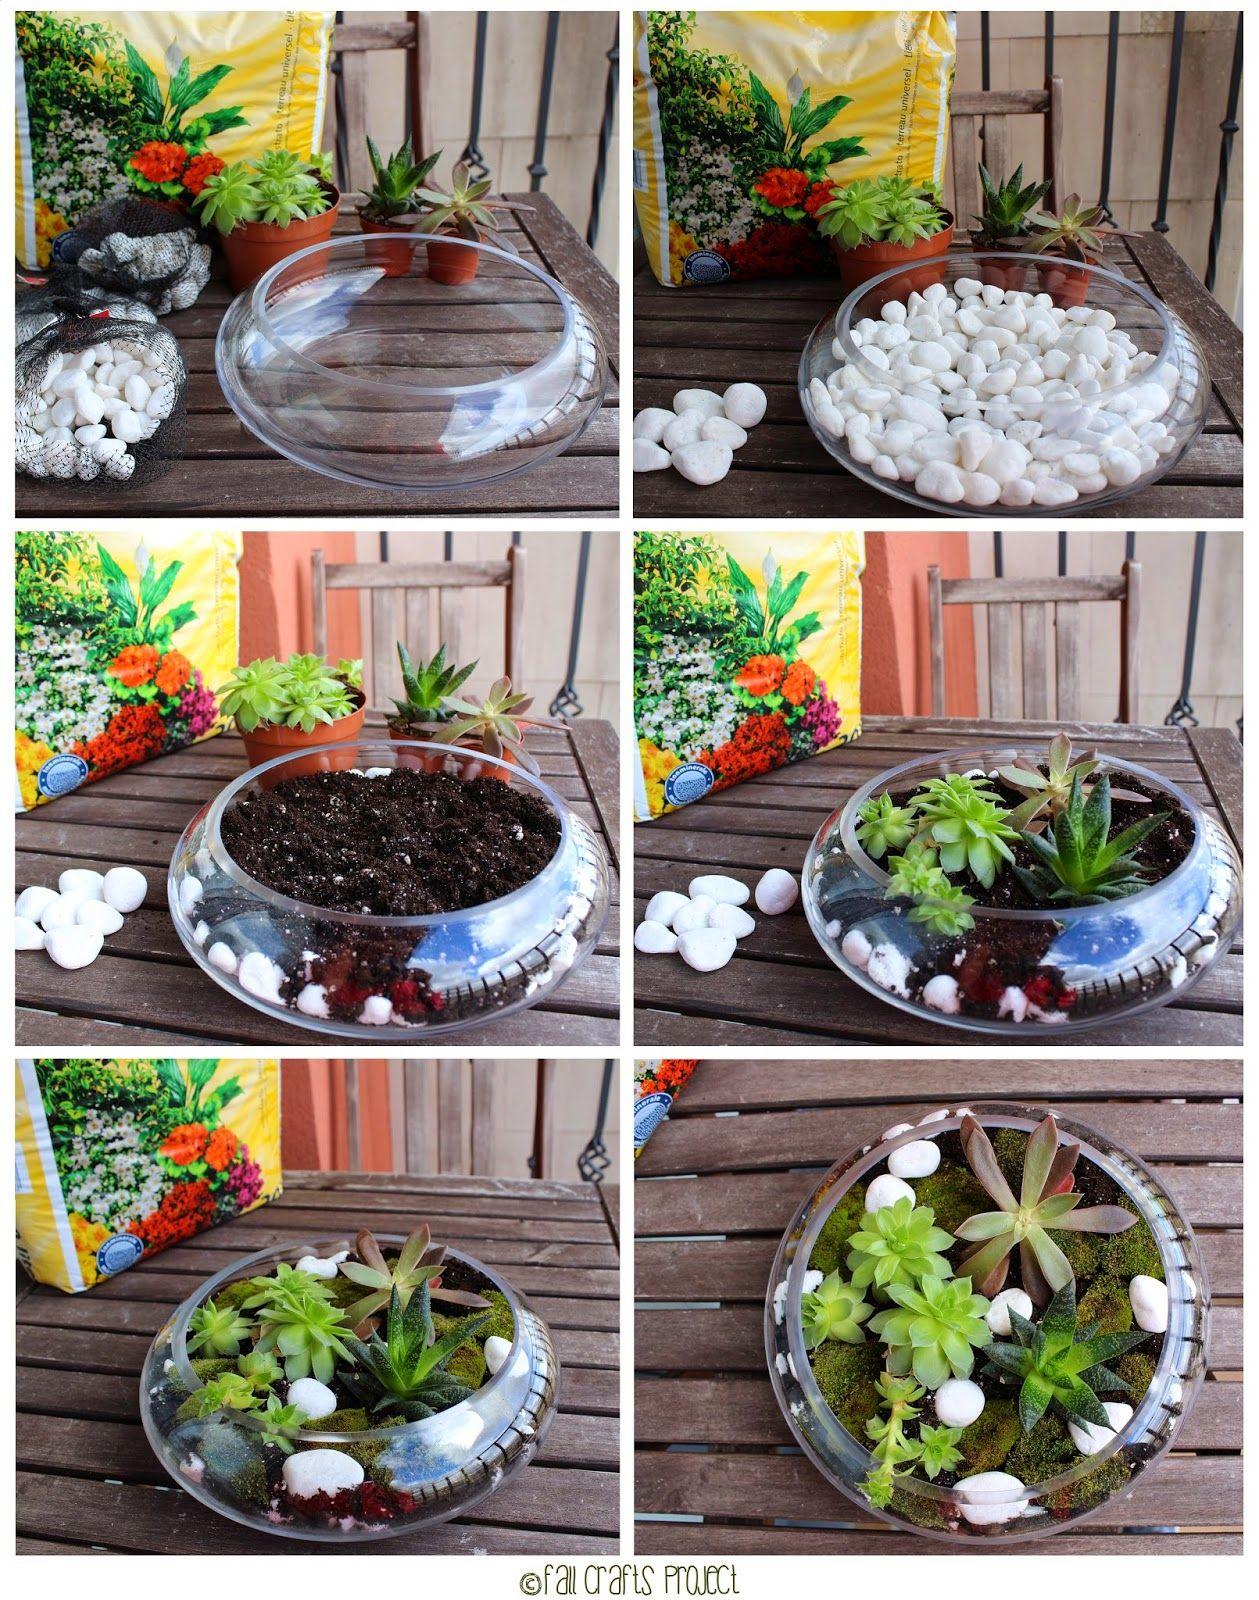 Terrarium originales buscar con google terrarios for Jardines pequenos originales